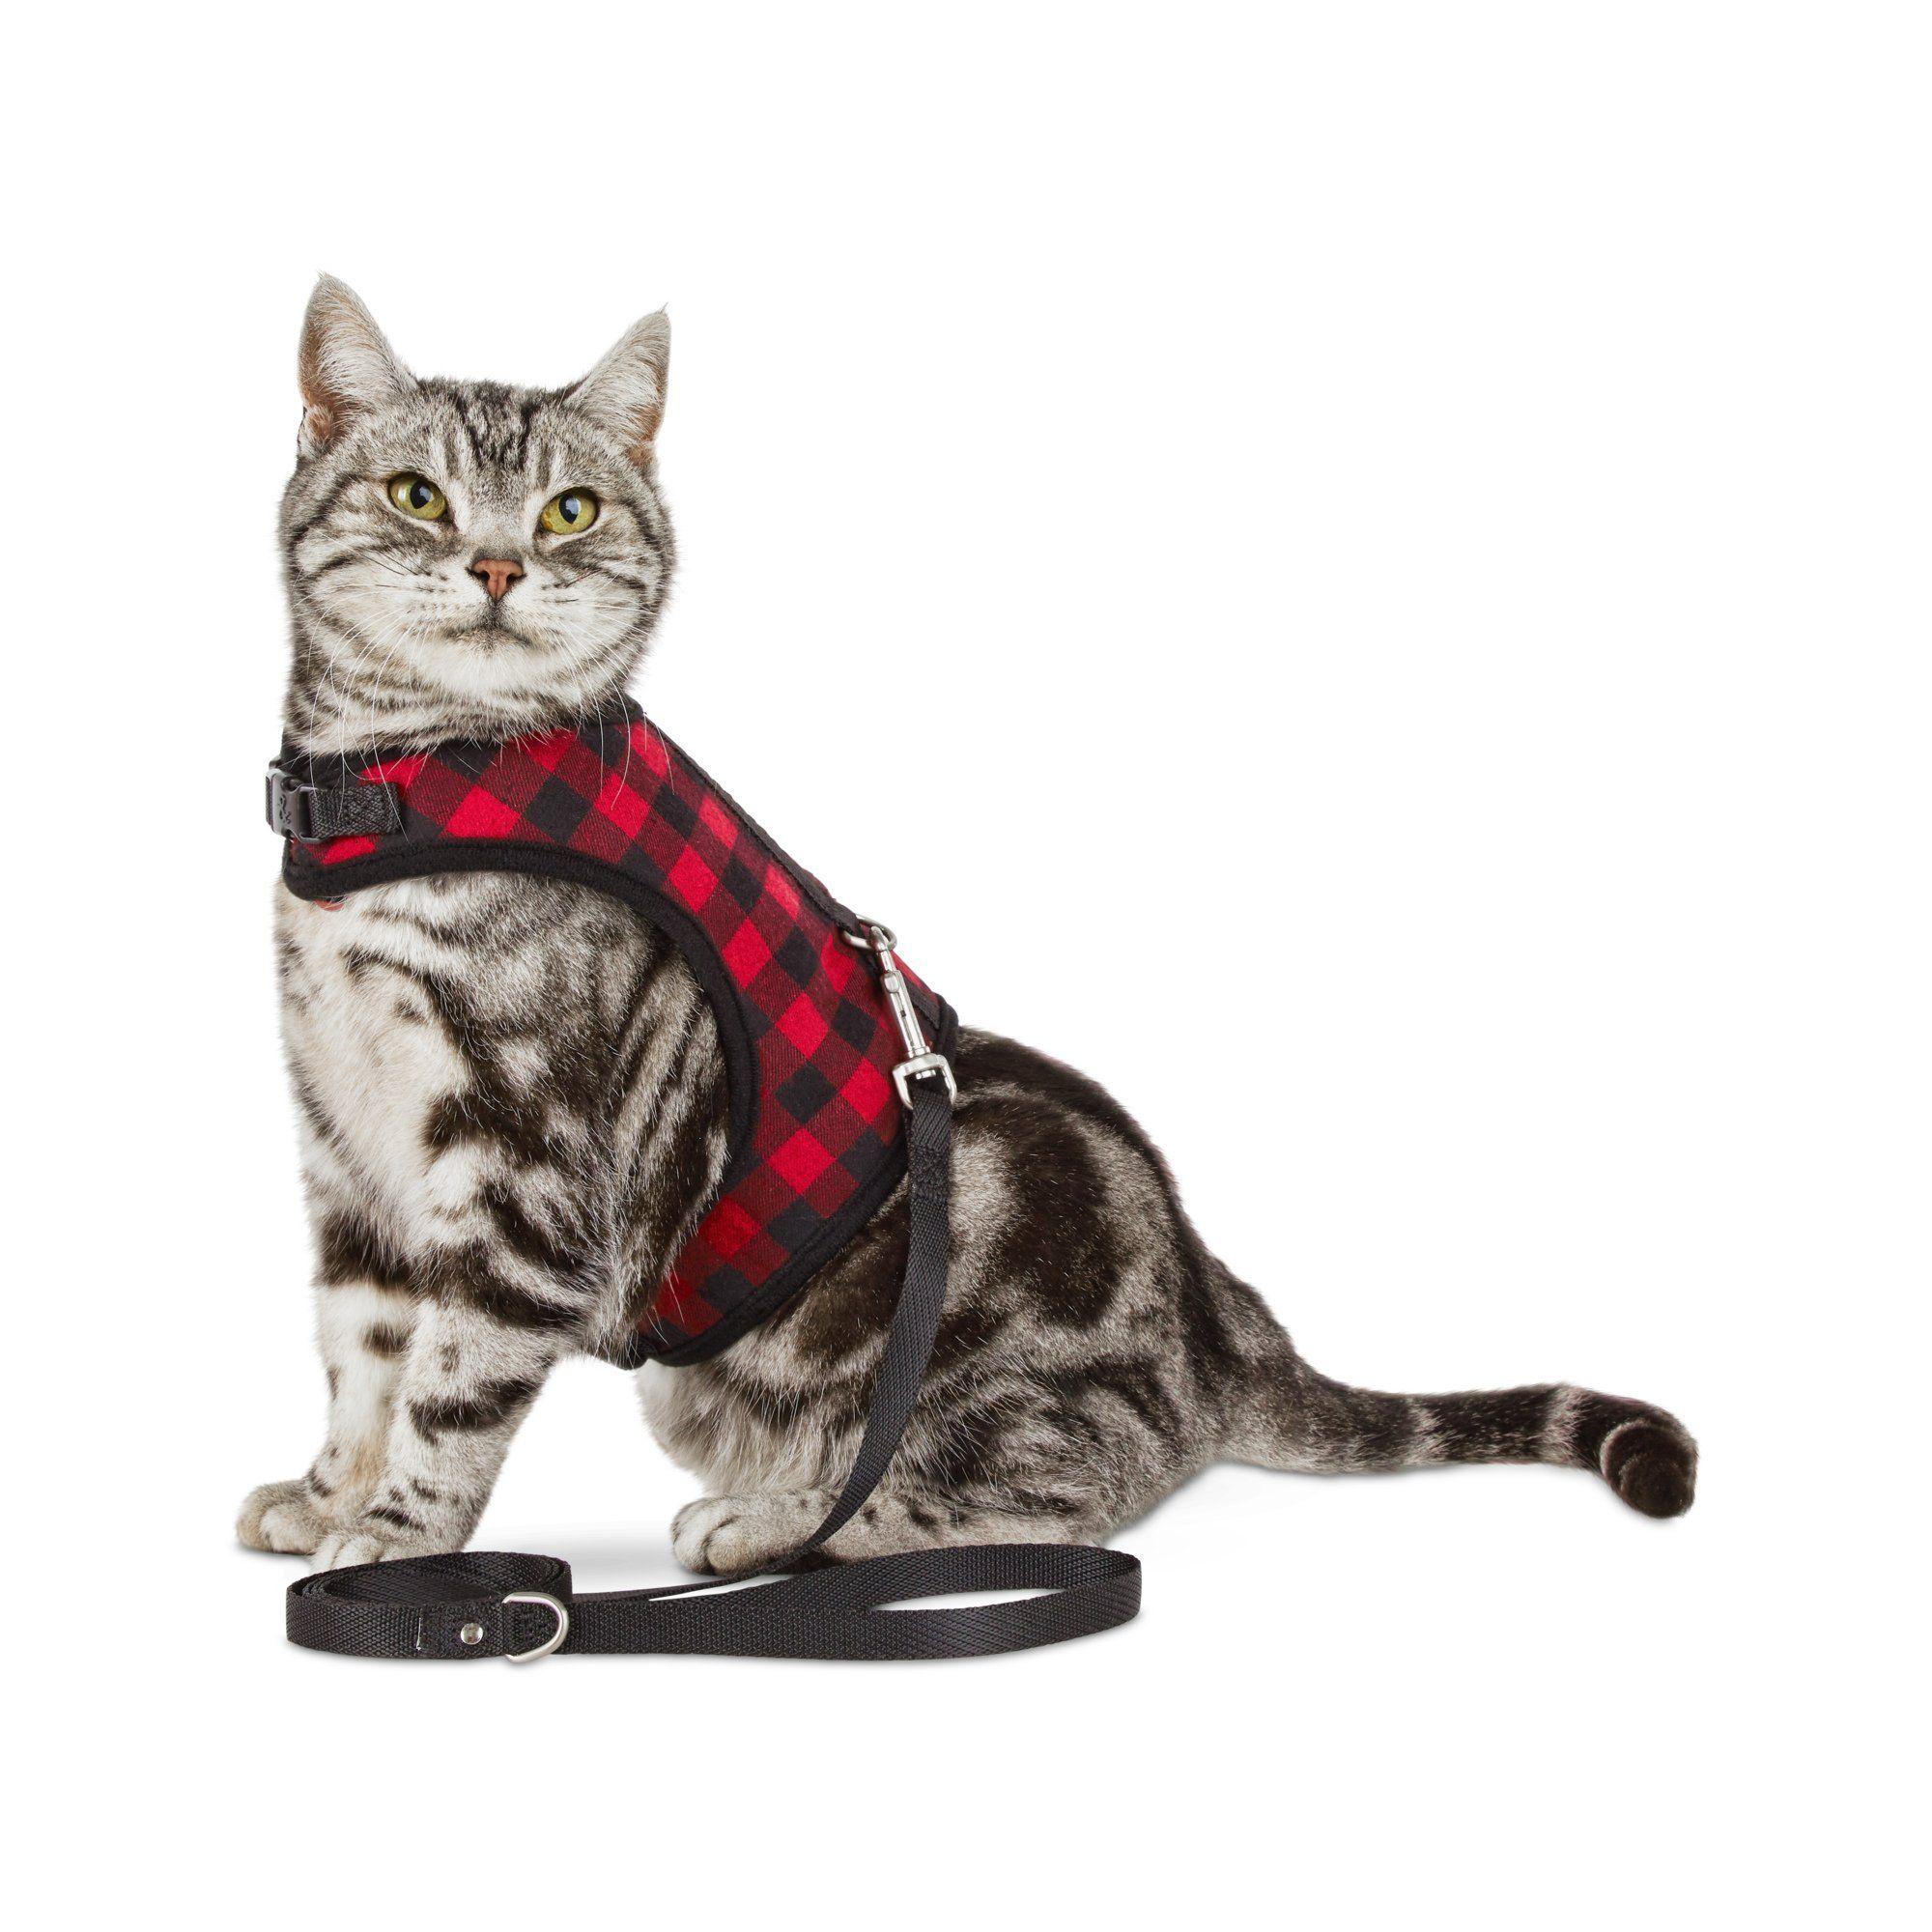 Bond Co Buffalo Check Cat Harness And Leash Set Petco Cat Harness Cat Leash Petco